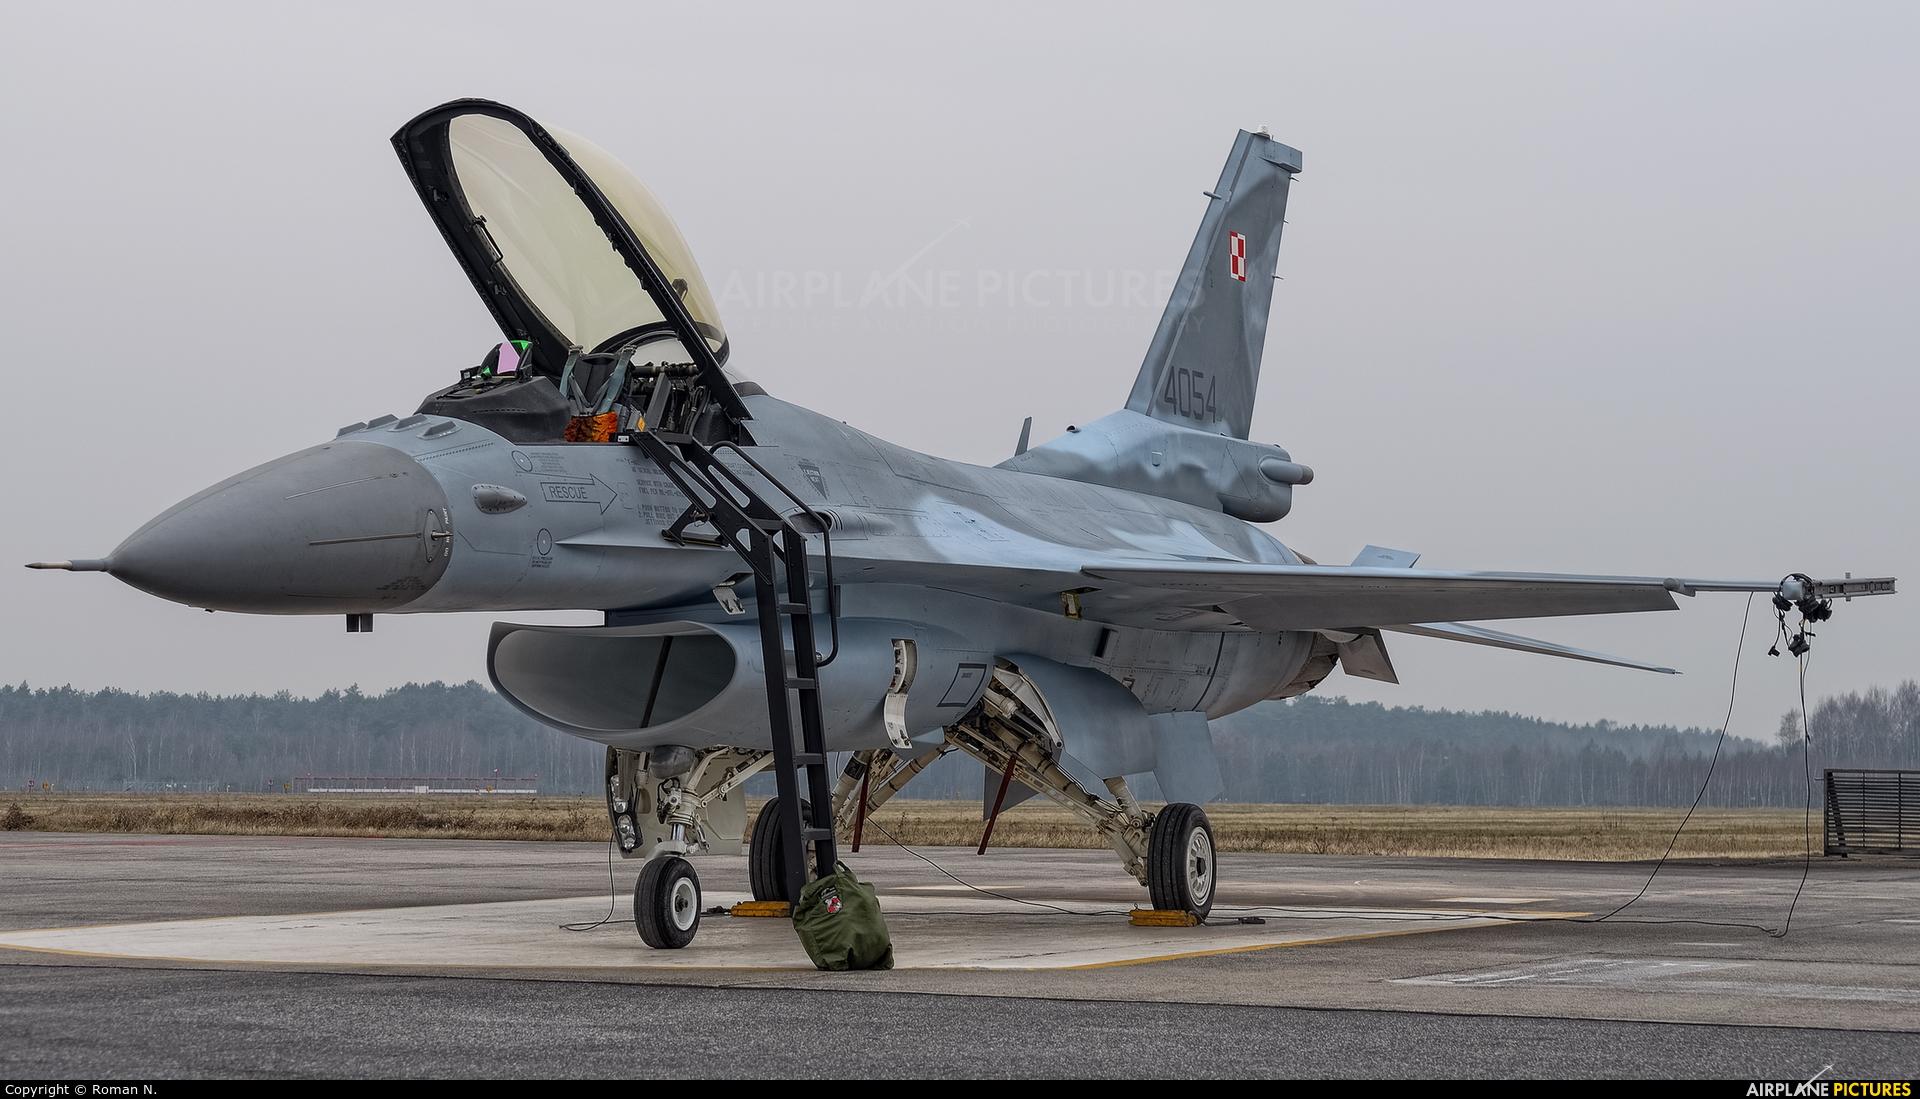 Poland - Air Force 4054 aircraft at Bydgoszcz - Szwederowo